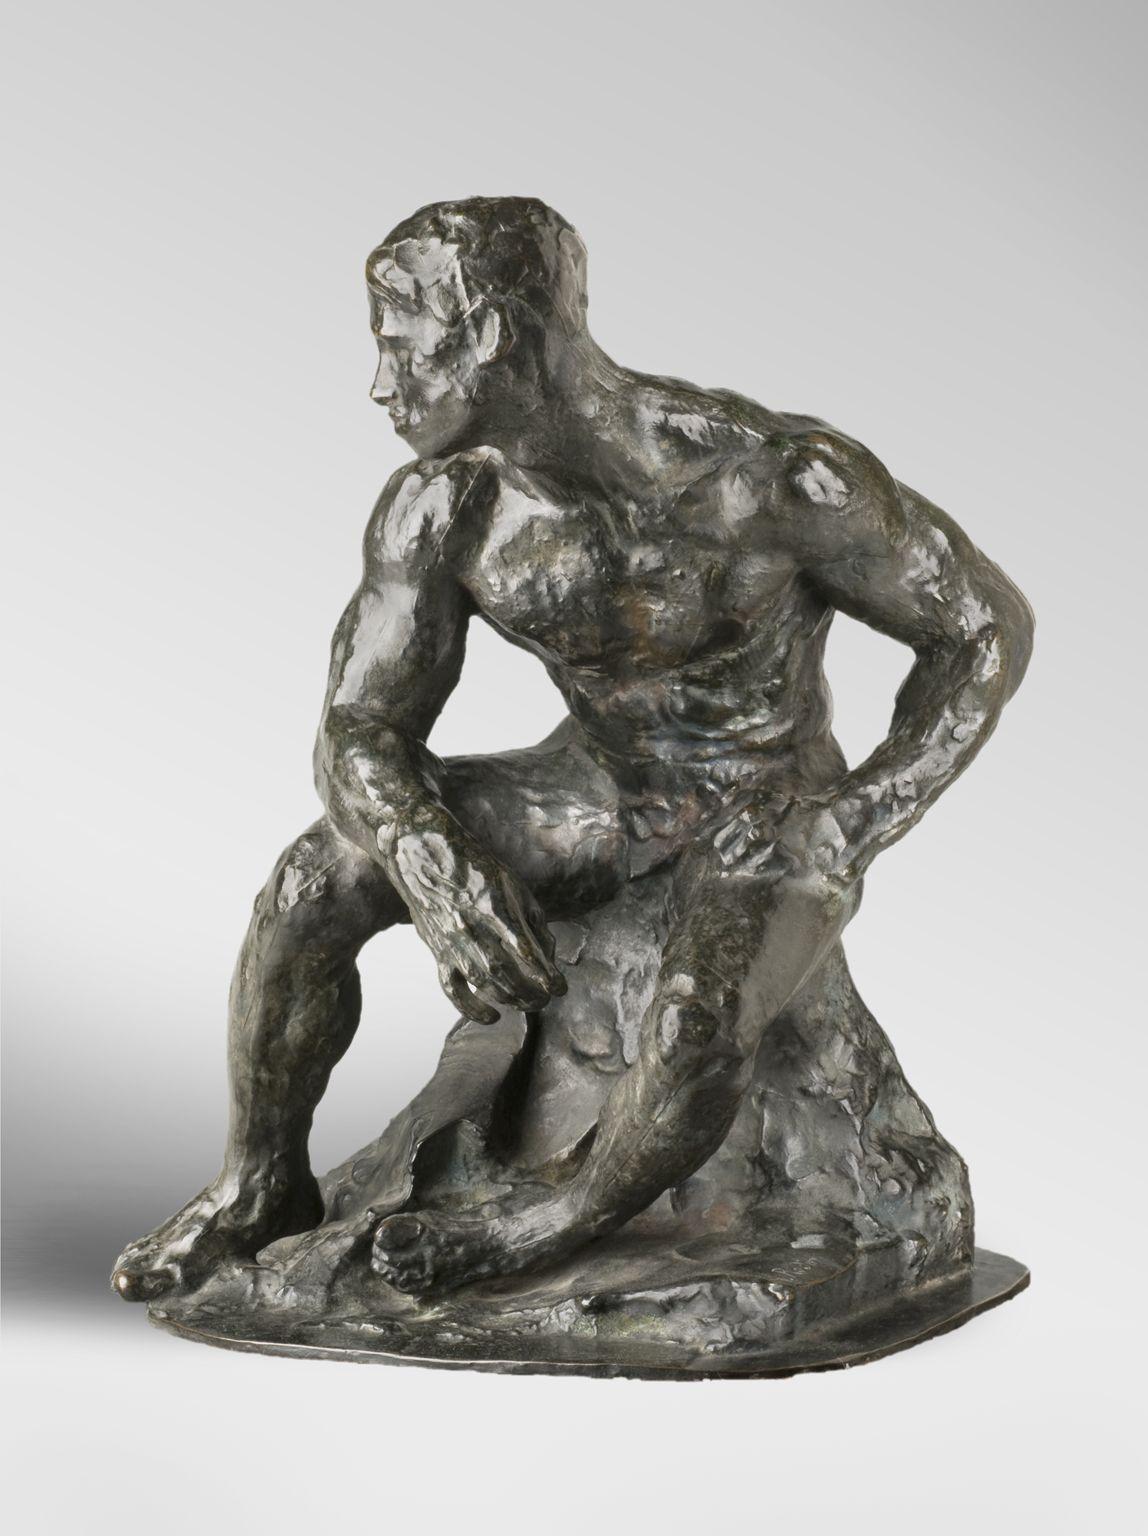 Auguste Rodin, Atleta (1901, fuso nel 1925; bronzo, 42,9 x 31,8 x 28,6 cm; Filadelfia, Philadelphia Museum of Art)